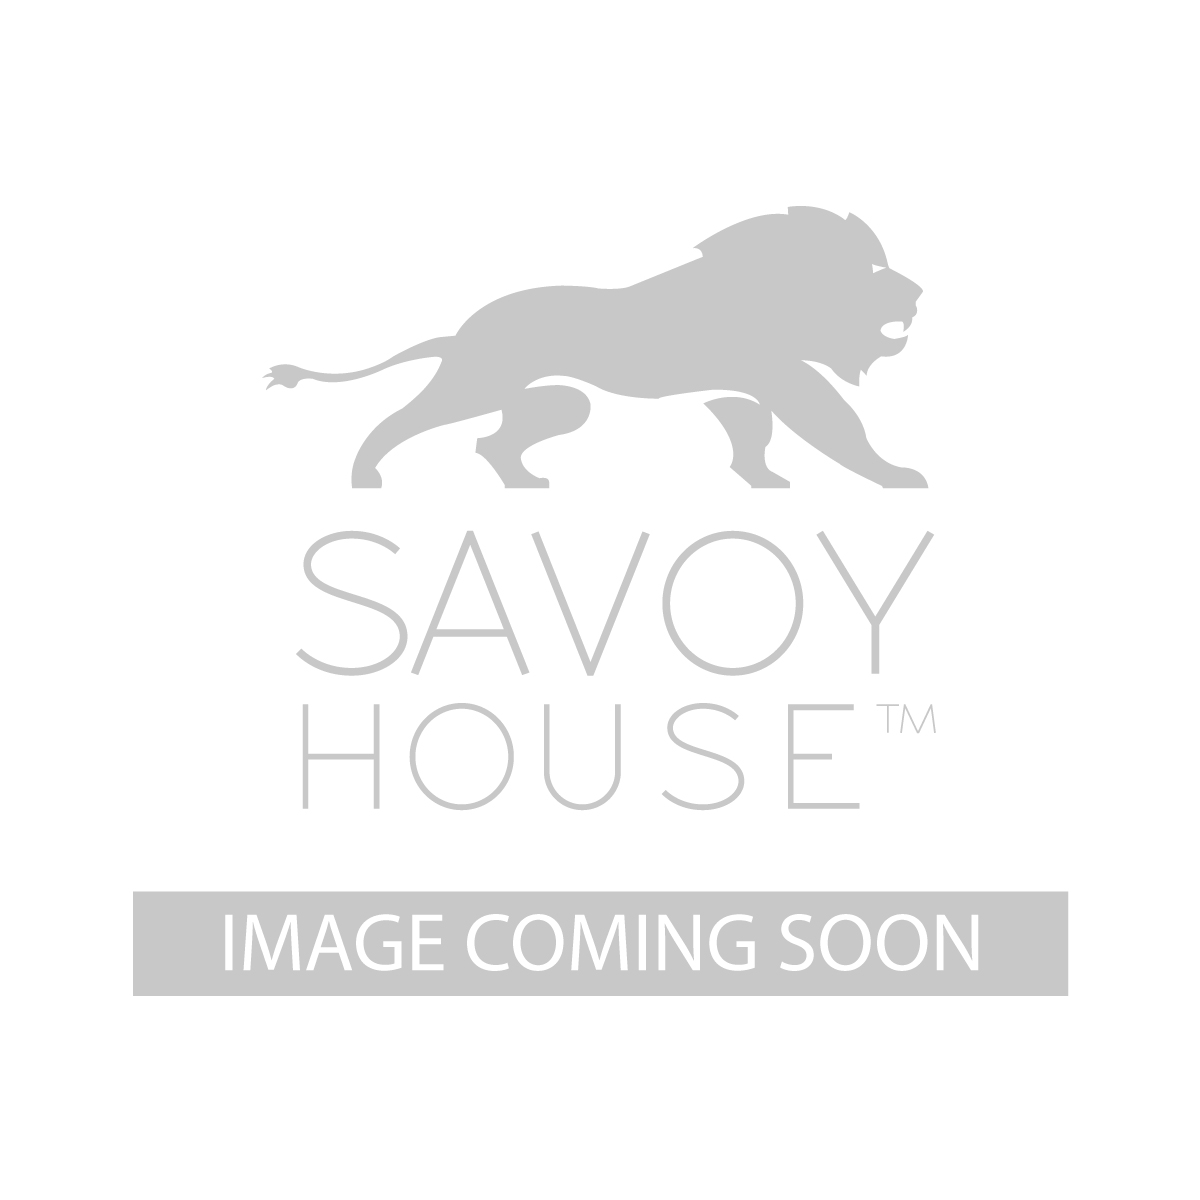 8 2102 4 sn grant 4 light bath bar by savoy house grant 4 light bath bar aloadofball Images